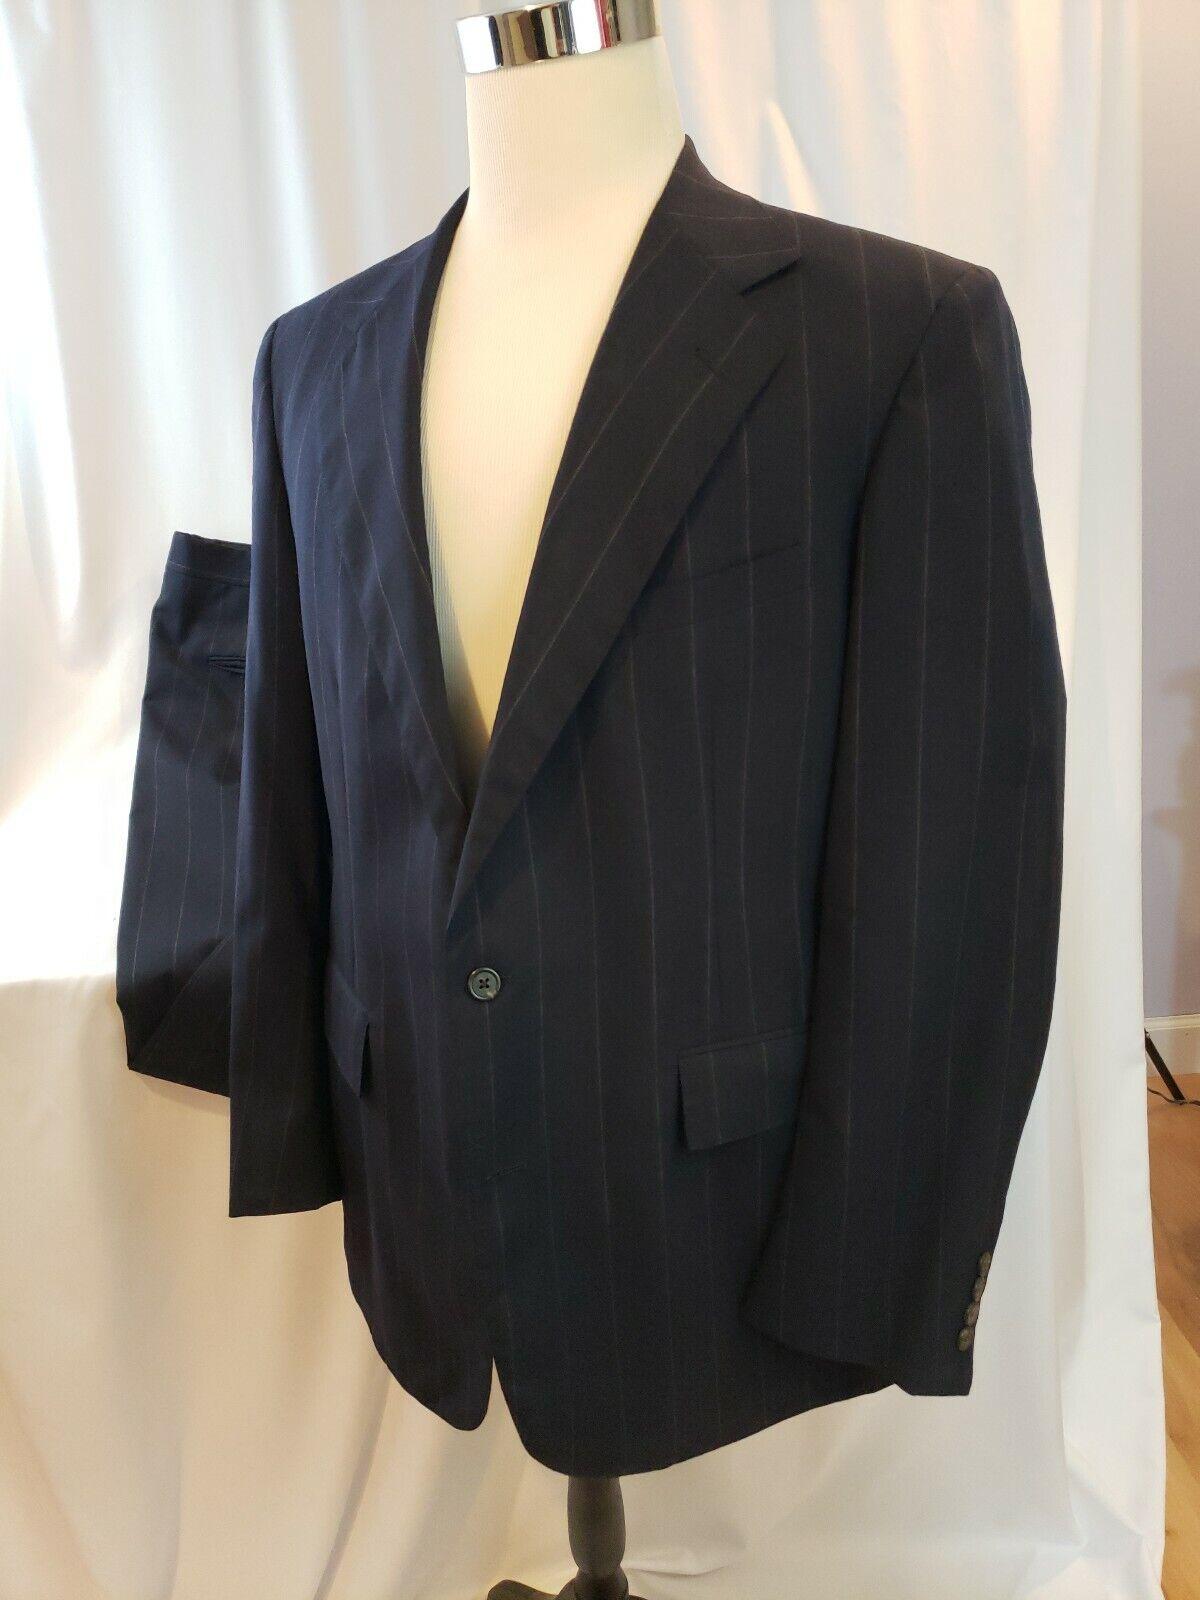 Vintage POLO Ralph Lauren Suit 42R - 36-32 cuffed Pants - Wool Striped - EUC